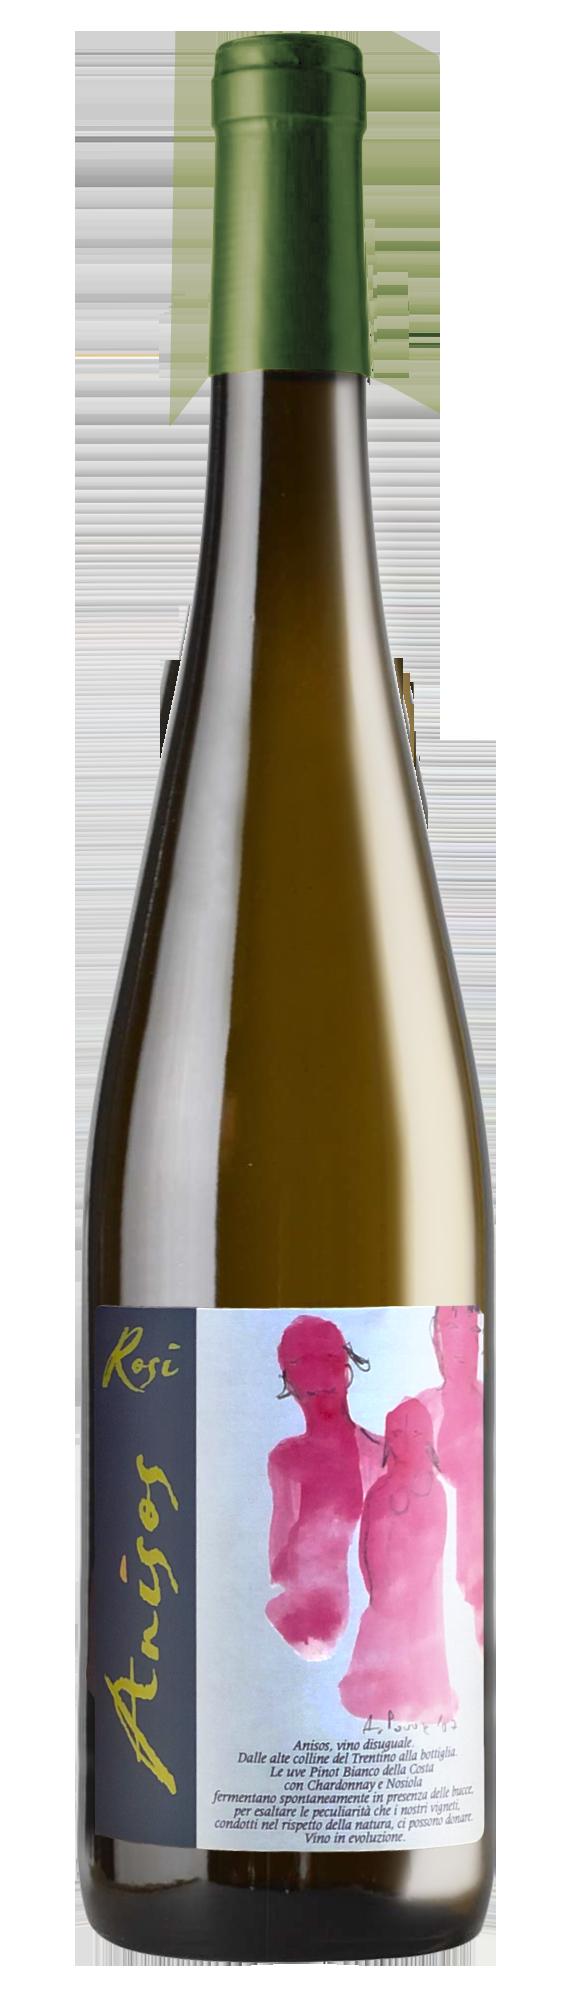 Eugenio Rosi Anisos - магазин склад winewine